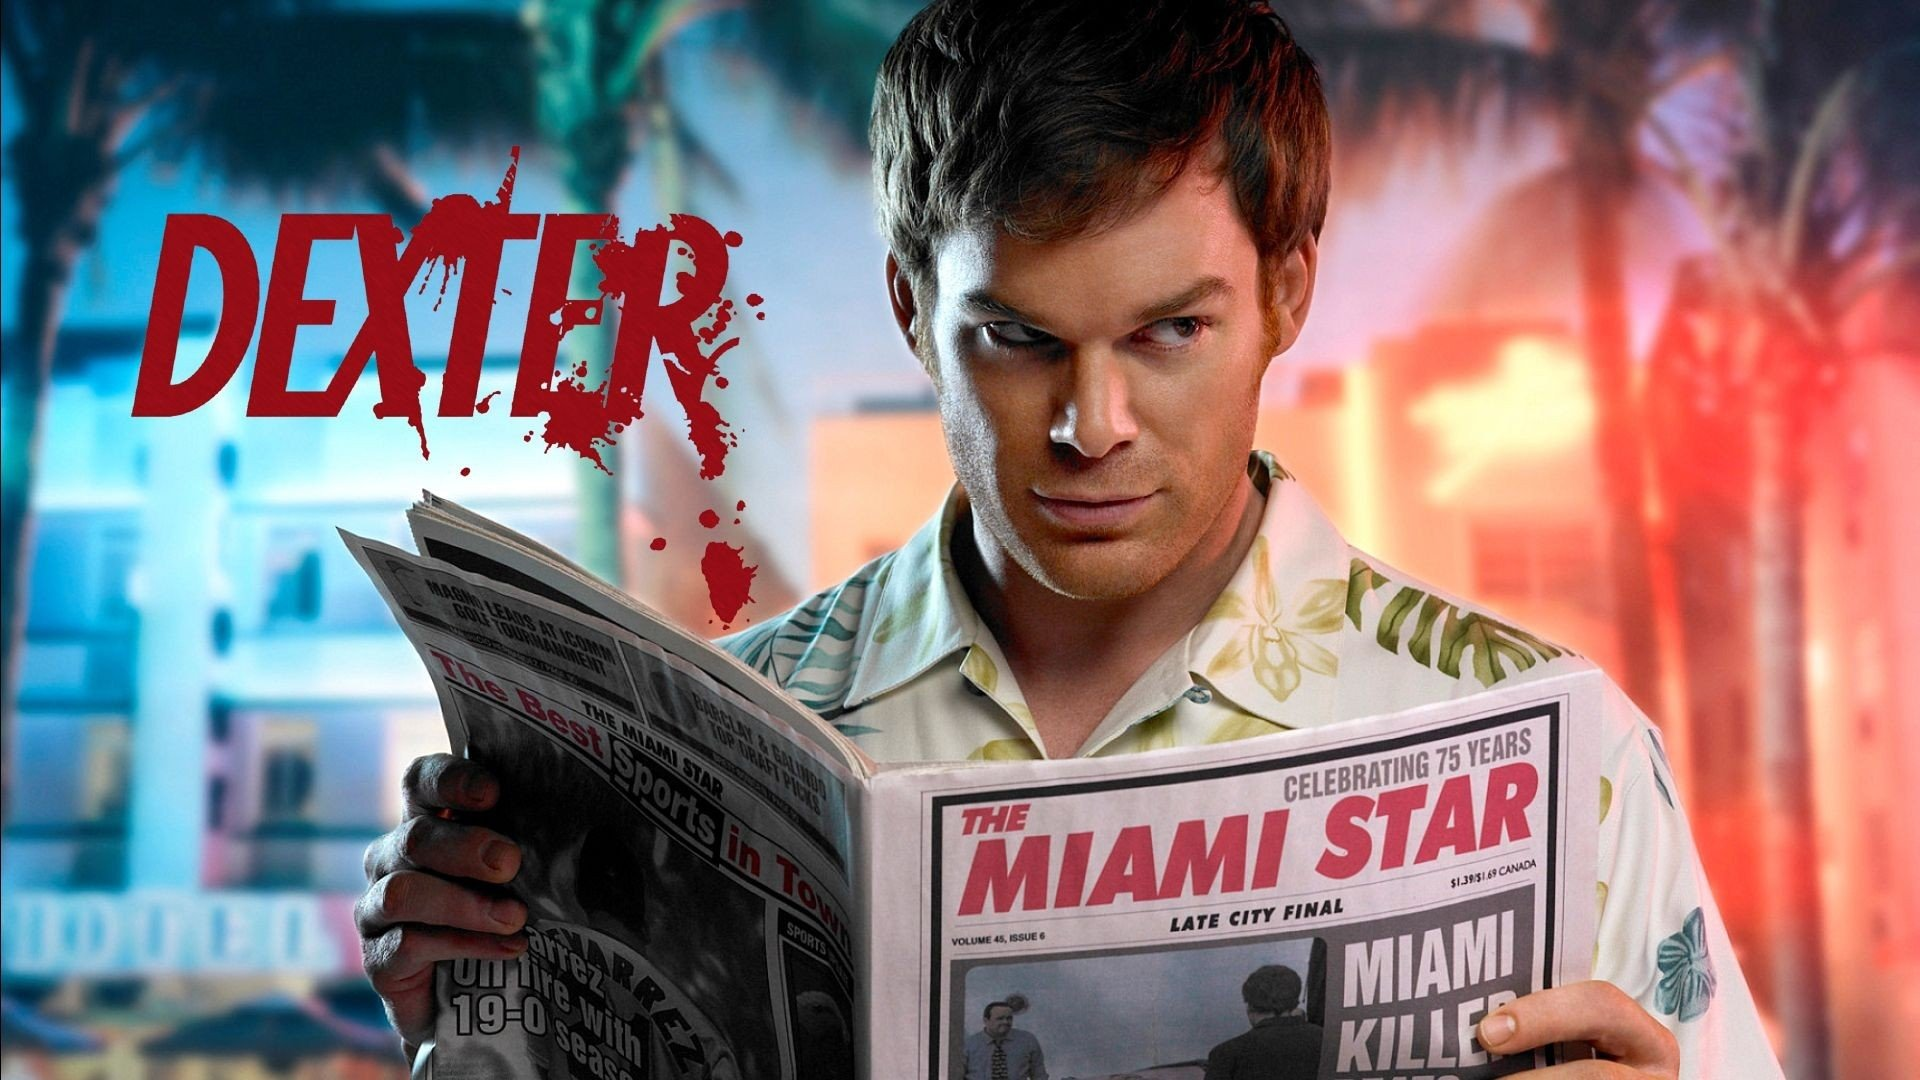 TV-program - Dexter  Michael C. Hall Dexter (TV Show) Dexter Morgan Bakgrund